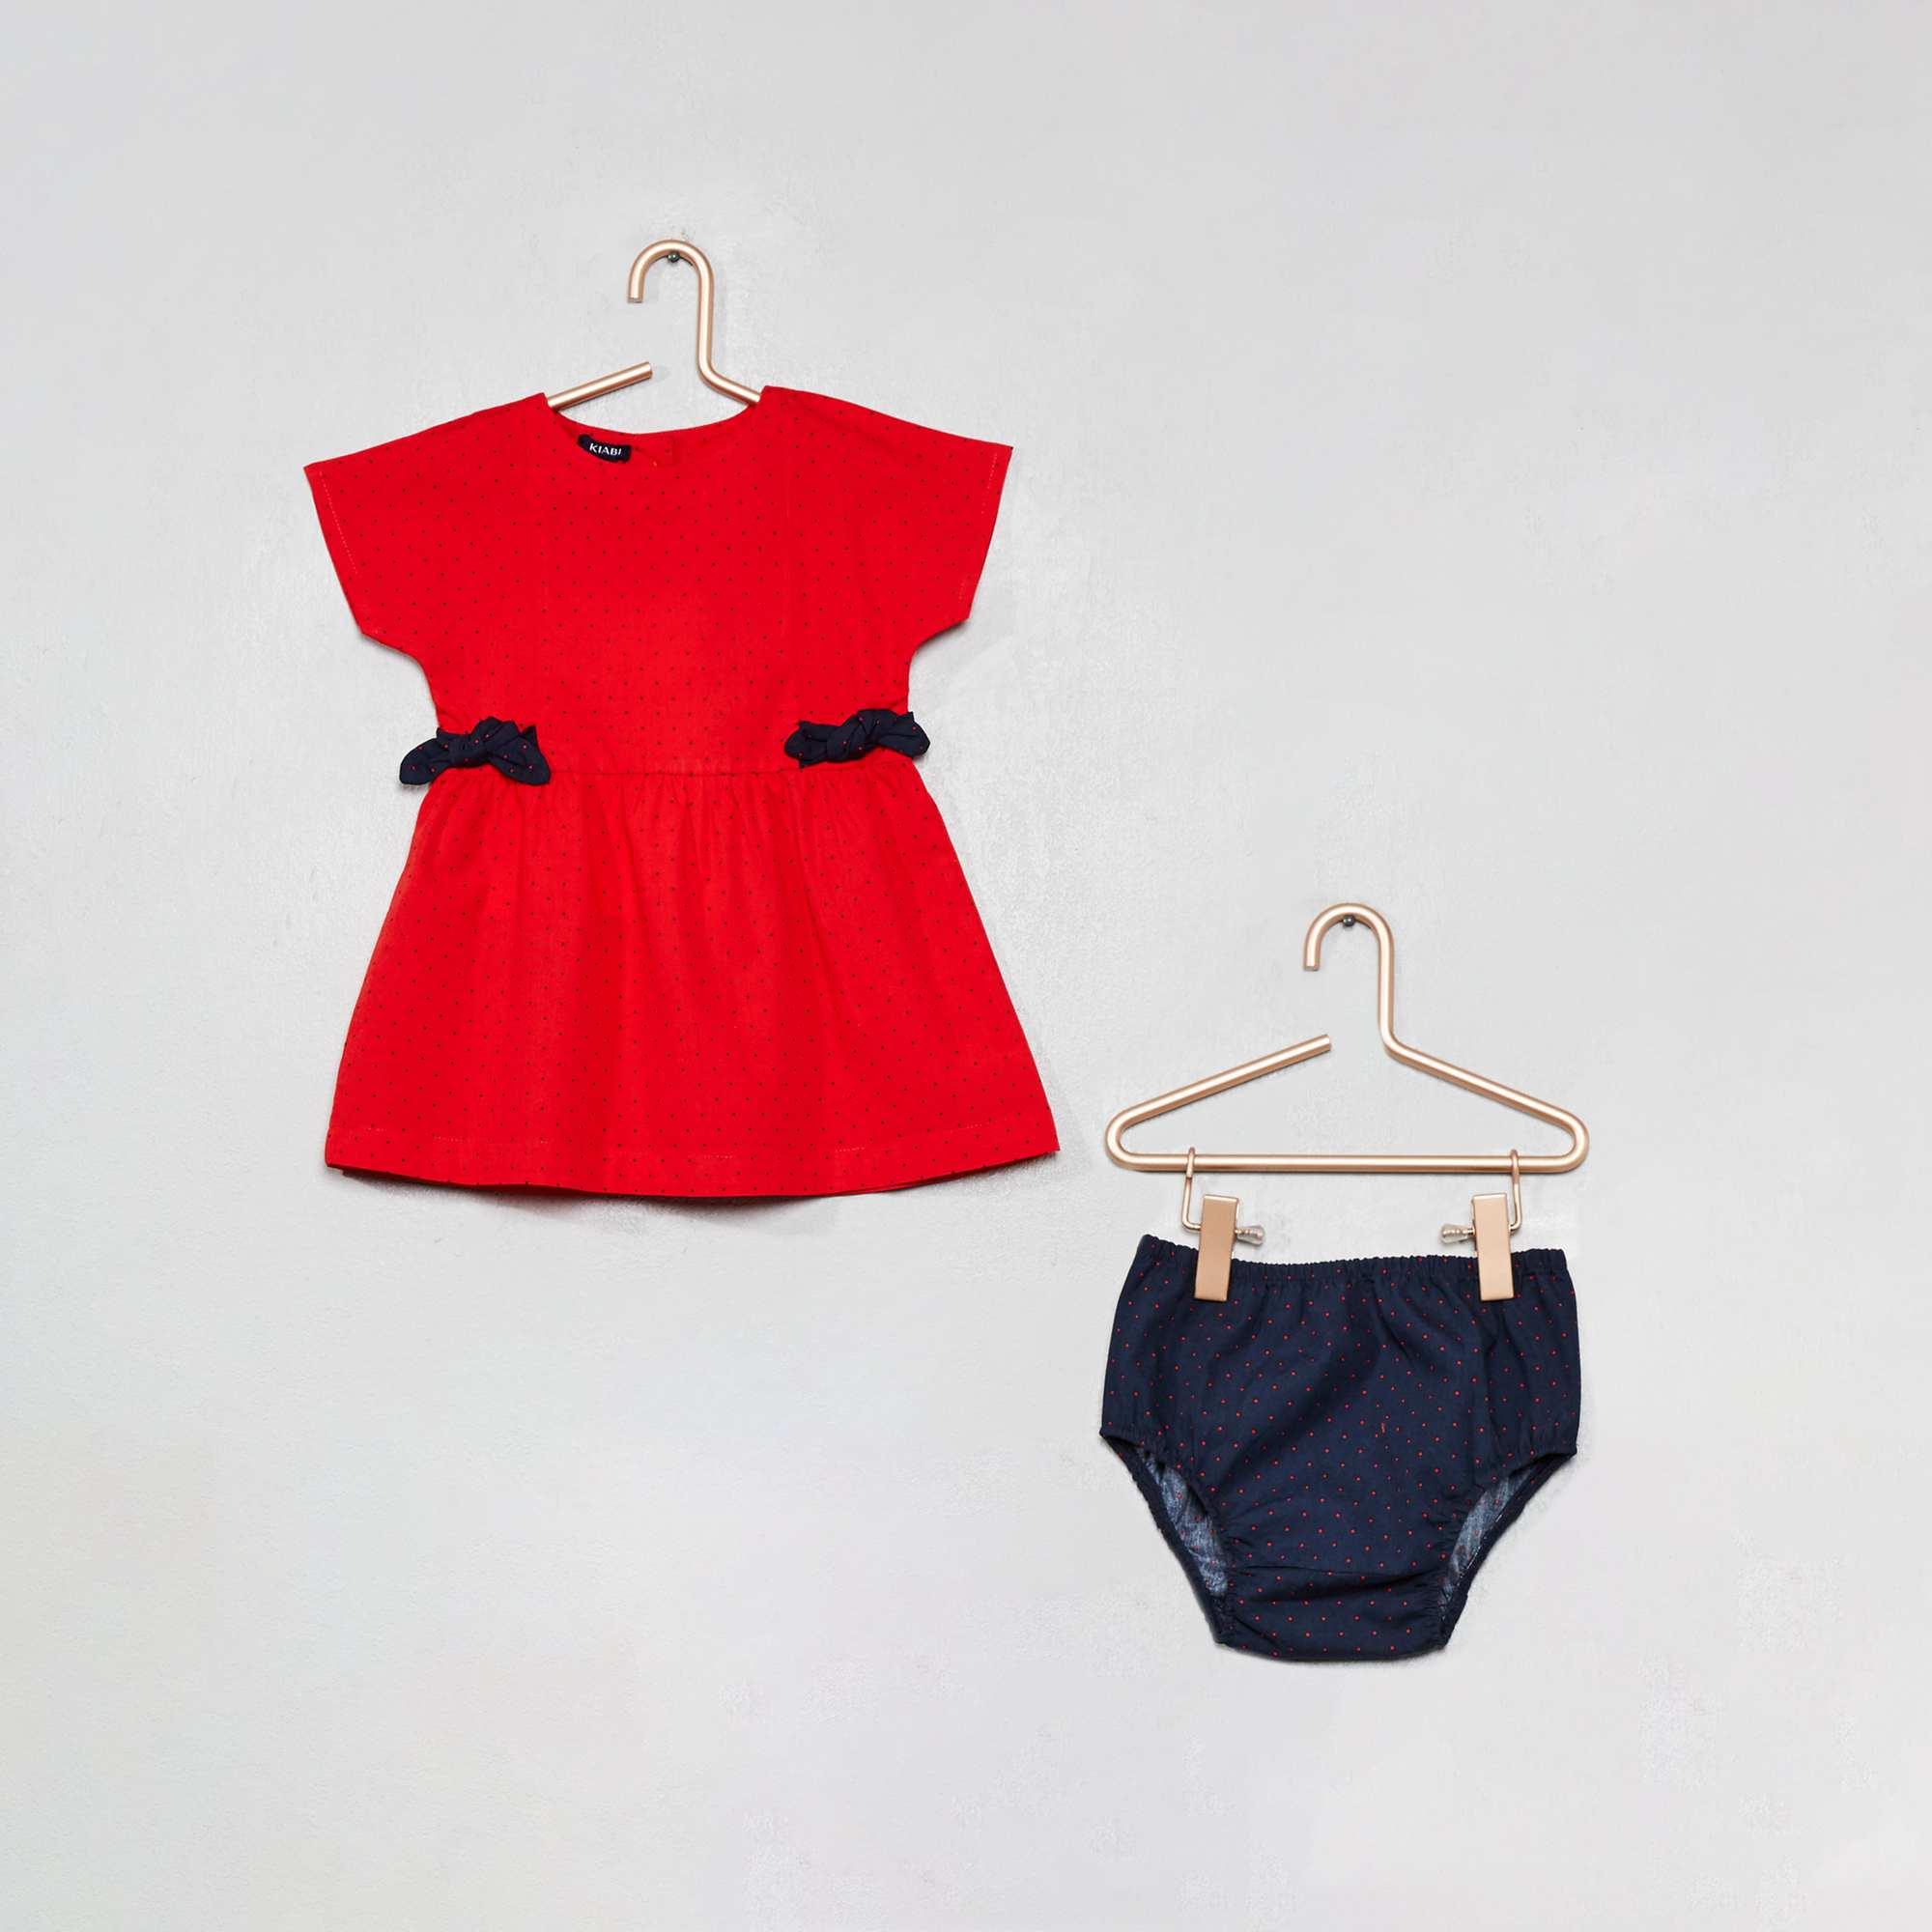 Vestido de popelina de lunares Bebé niña - ROJO - Kiabi - 13 604159d45cfa